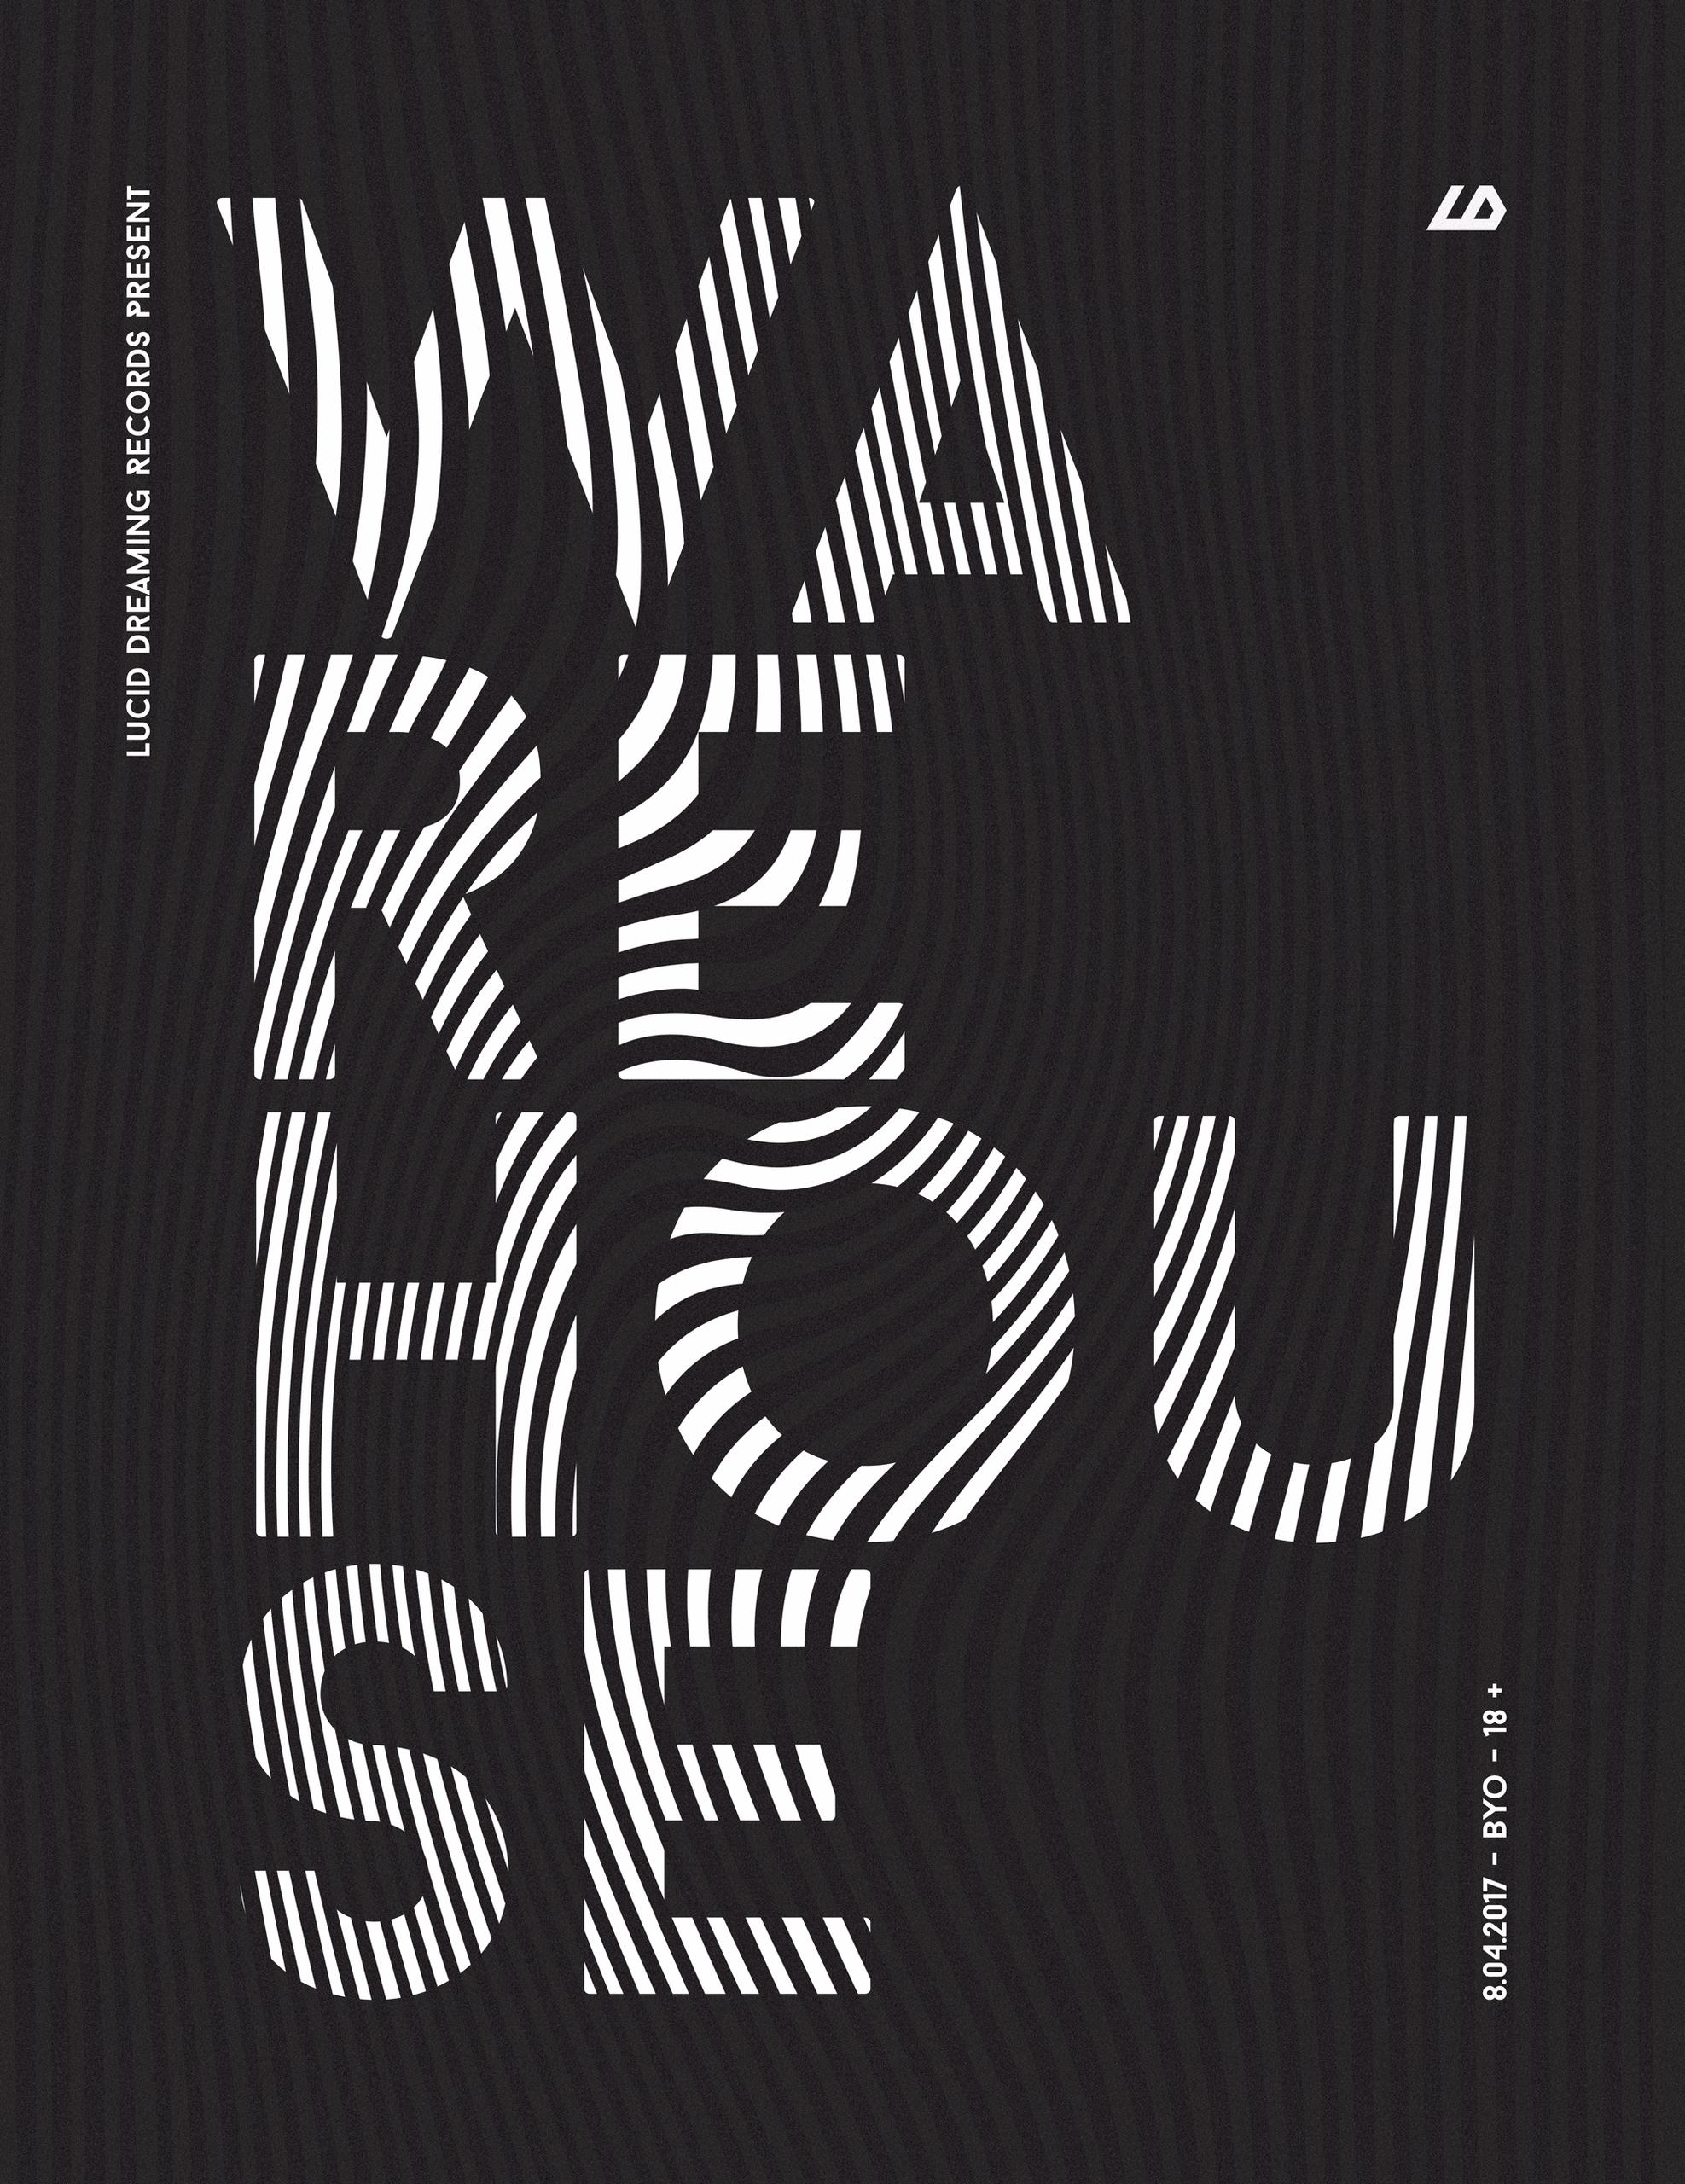 Poster Lucid Dreaming Records A - carolinanino | ello